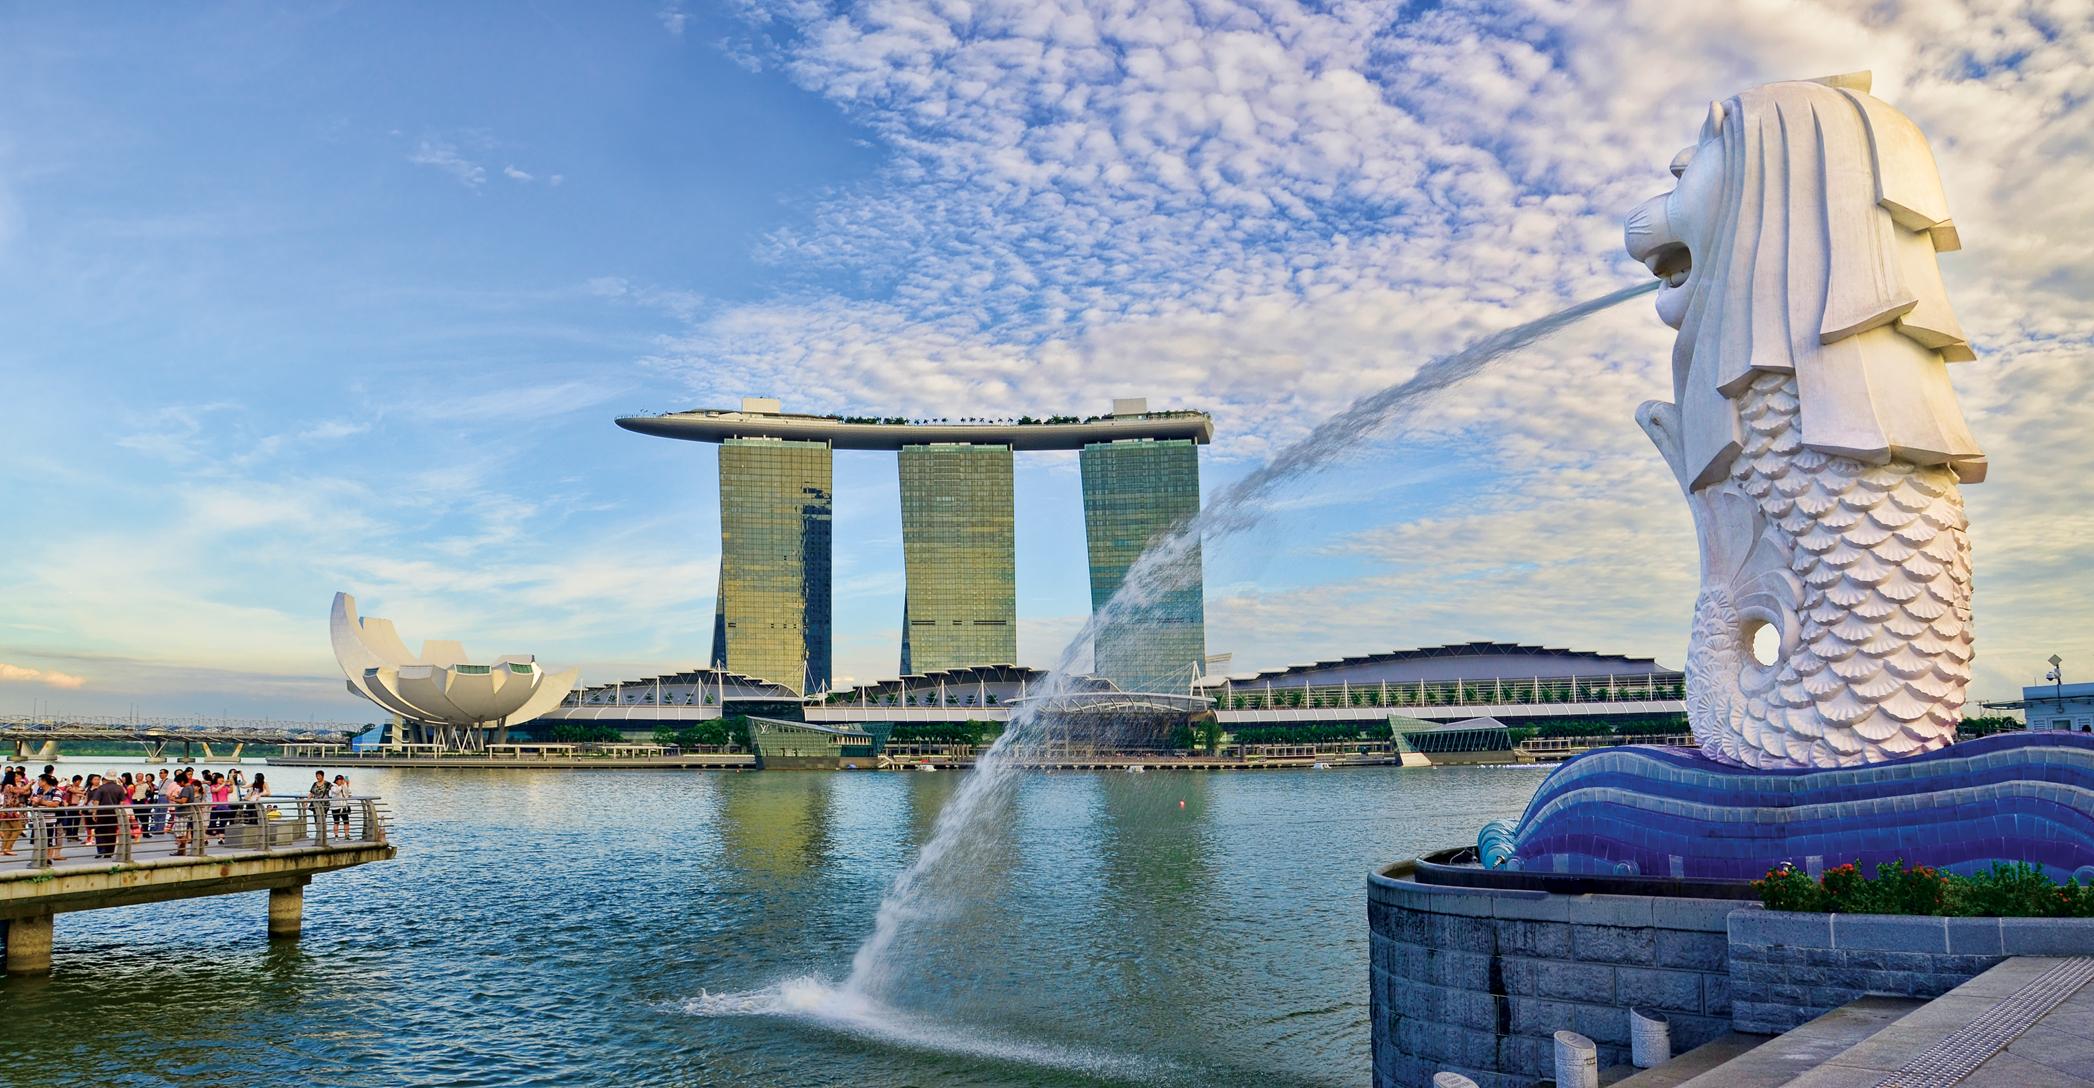 Wallpaper Sea City Architecture Water Building Sky Tourism